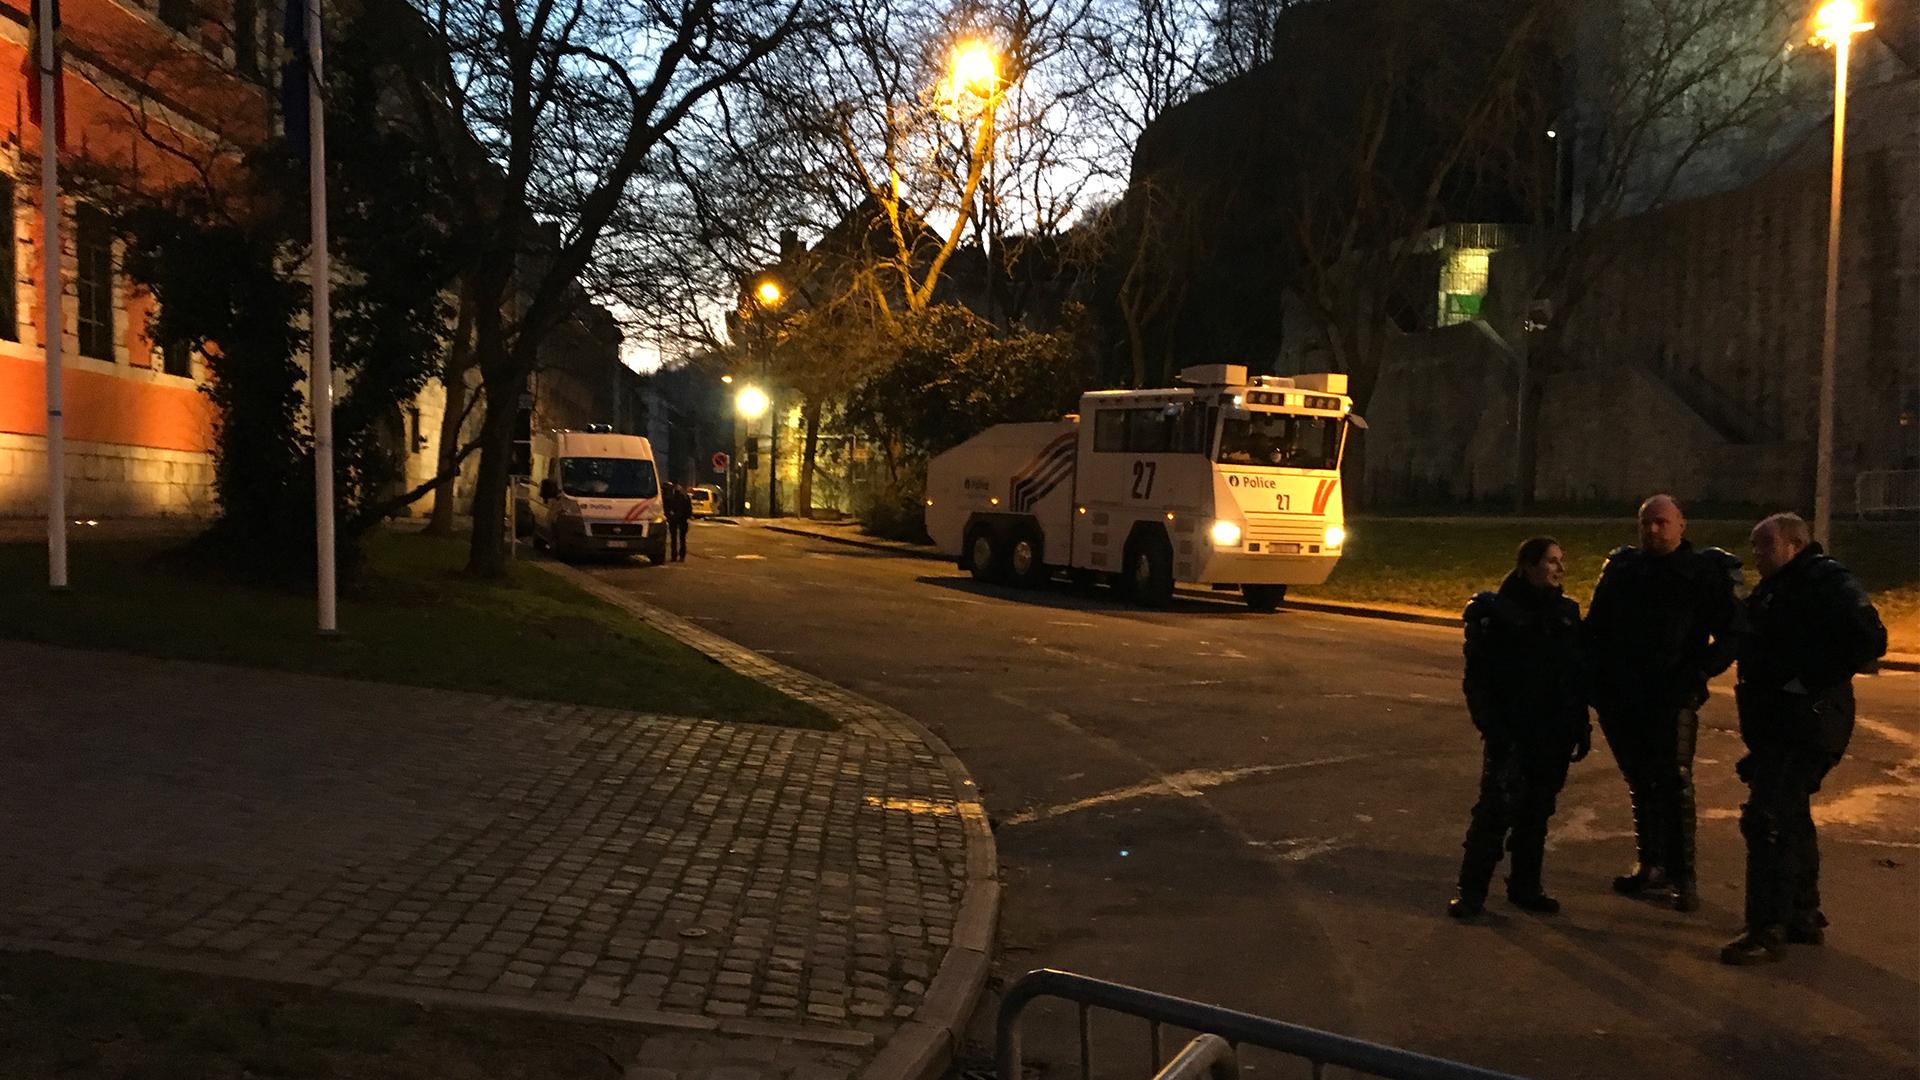 Manifestation des gilets jaunes: l'acte V des Namurois